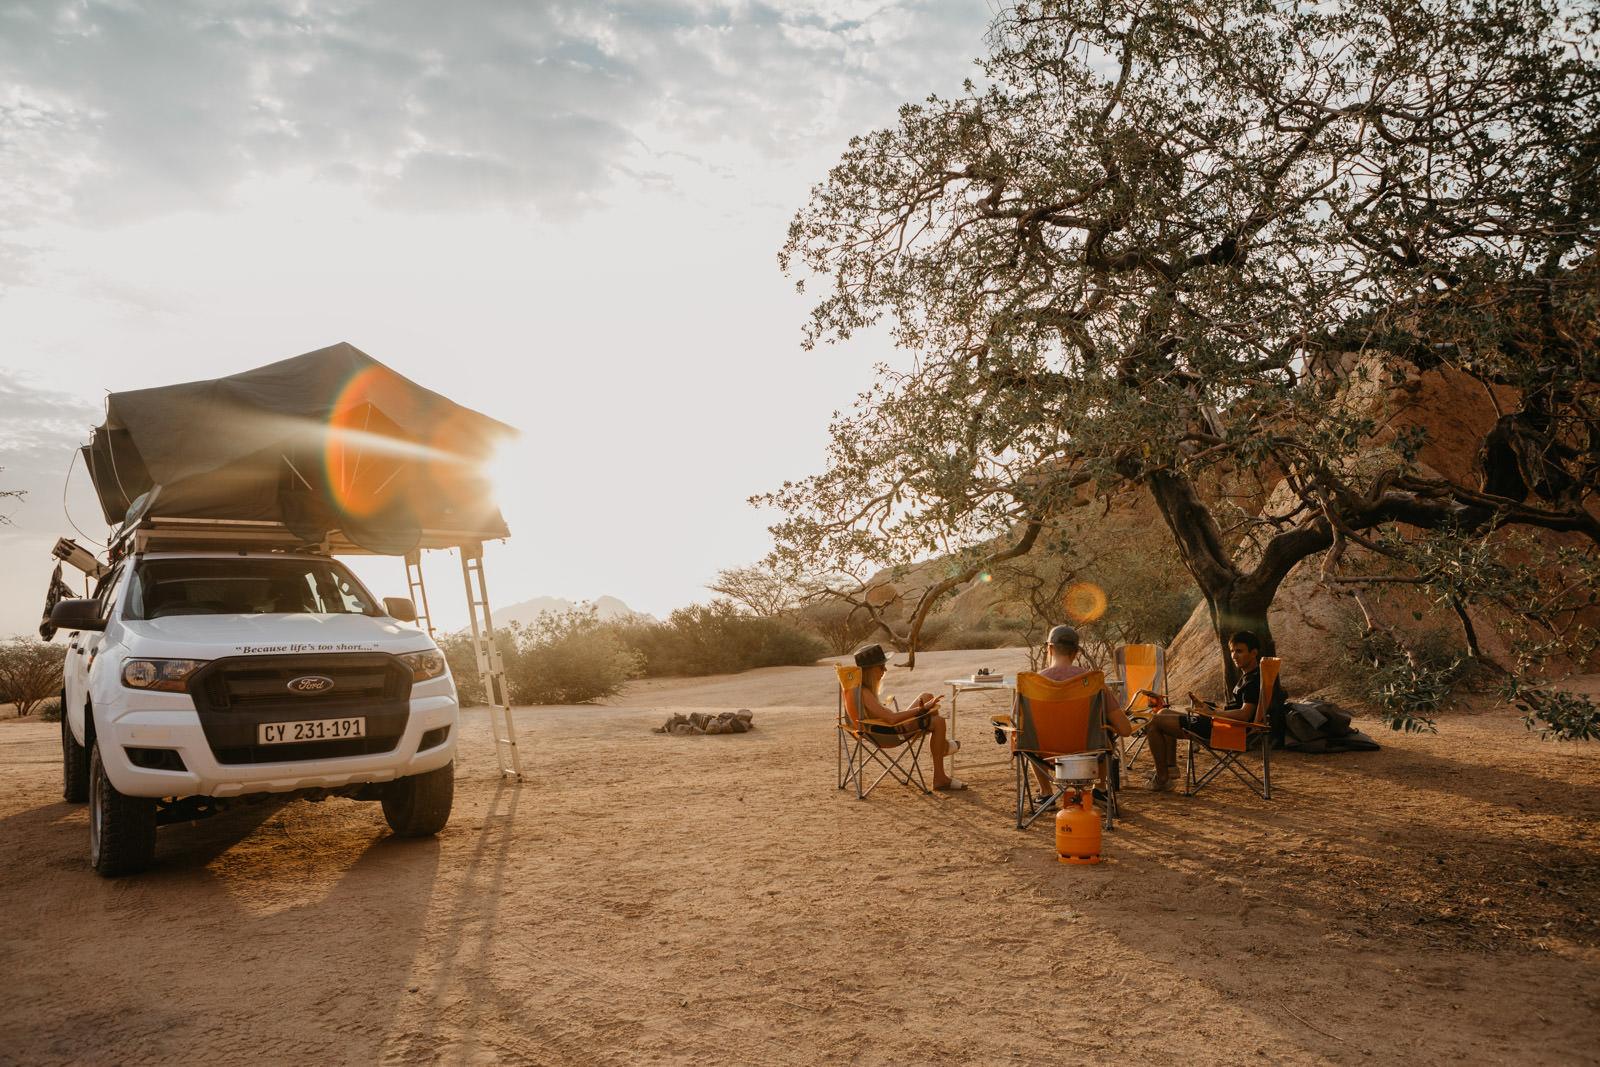 namibia_trip_rooftent_camping_roadtrip (10 von 18).jpg